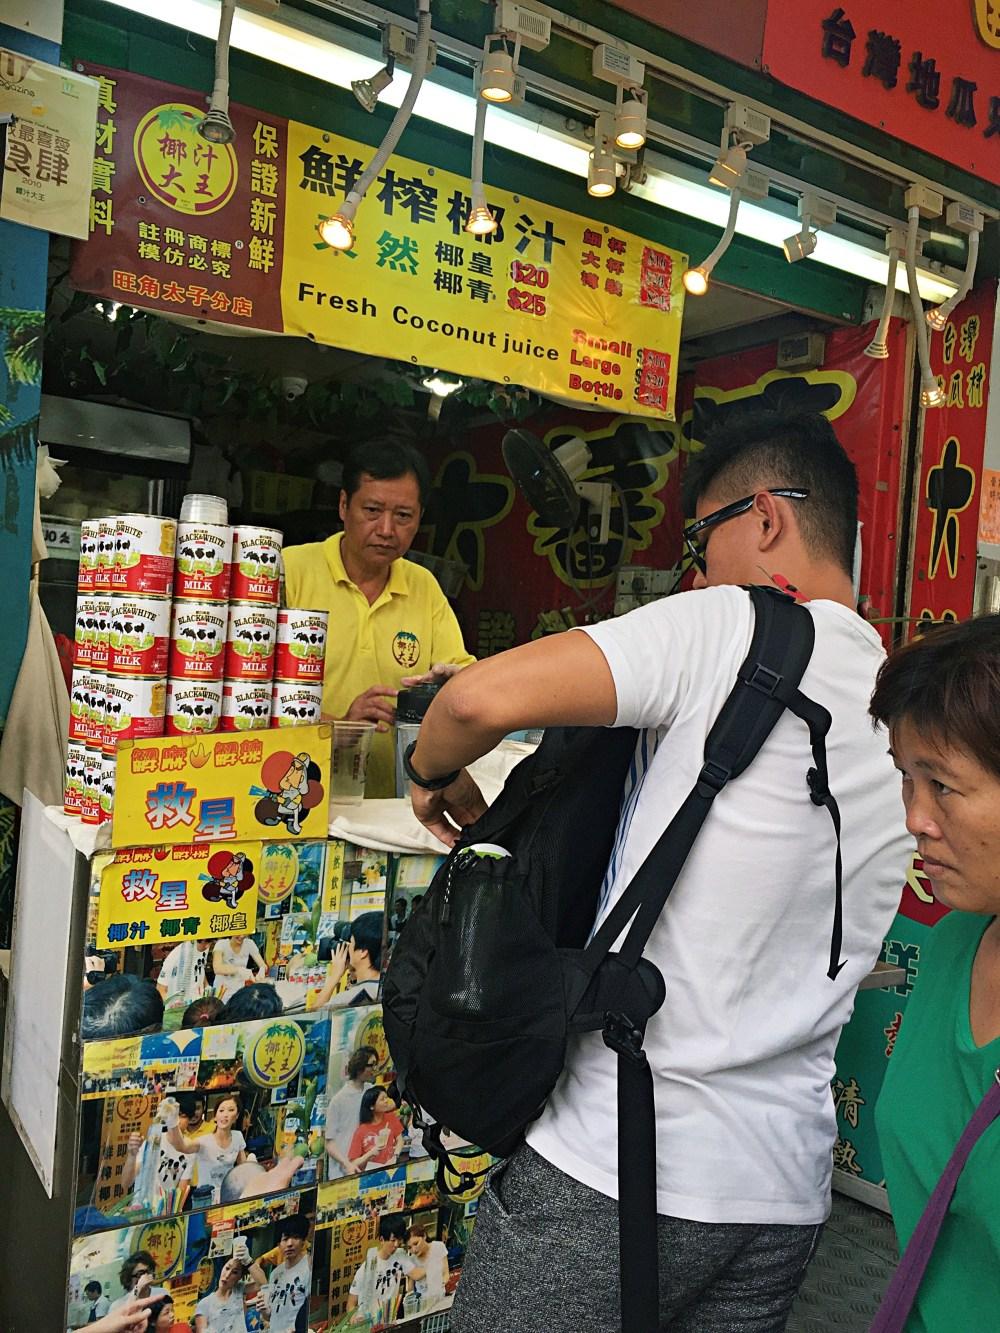 7 Nov 2015: Nullah Road | Mong Kok, Hong Kong